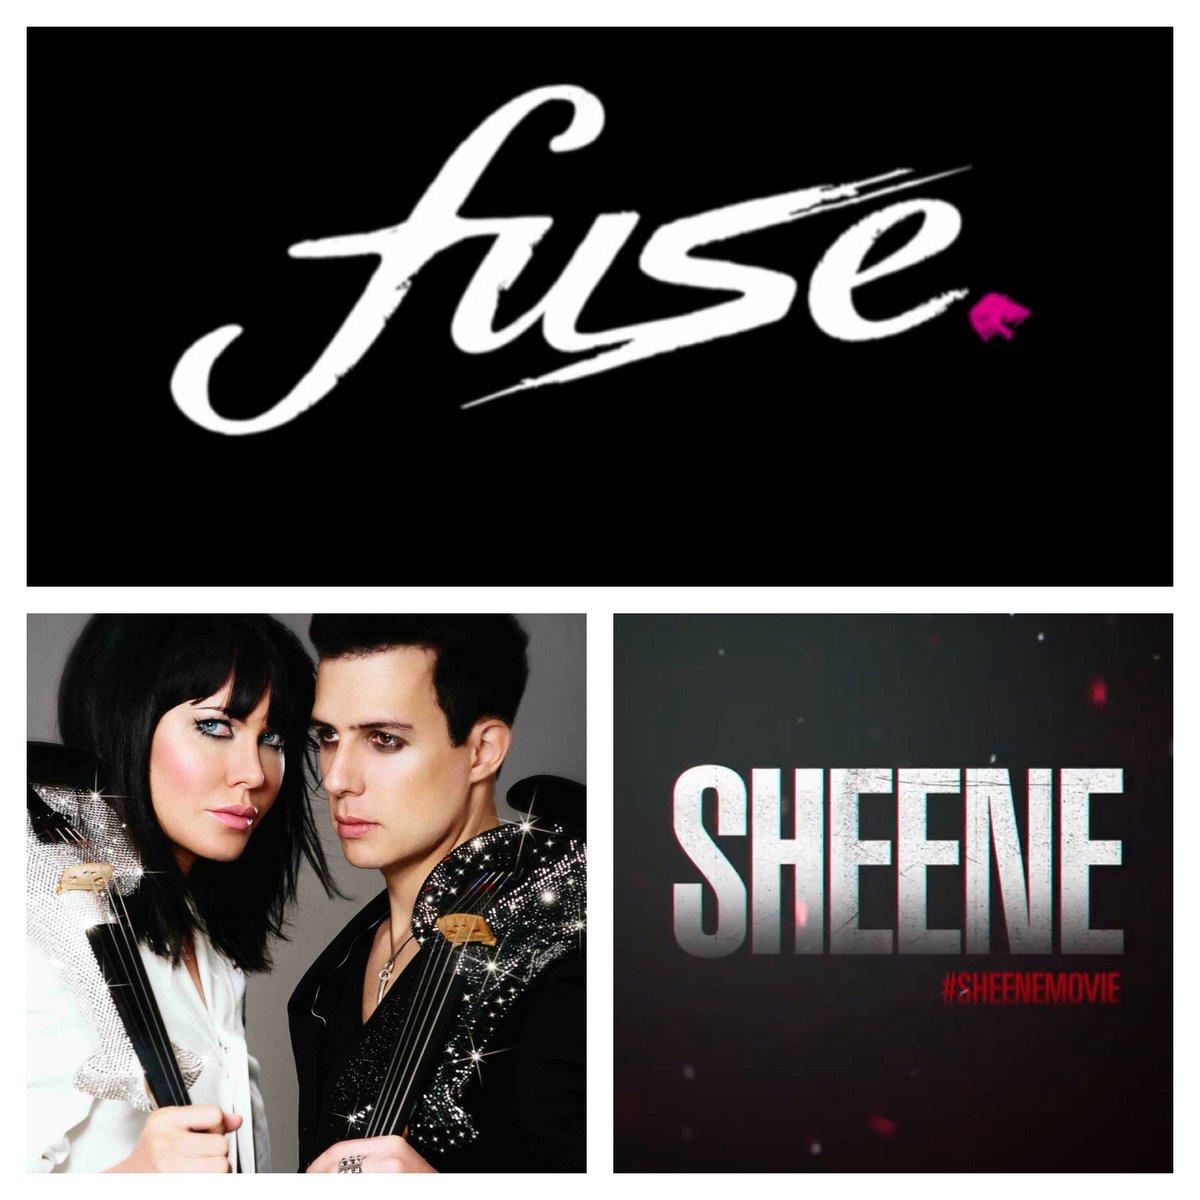 Excited! @FUSEband original #soundtrack 4 new #sheenemovie !#electricviolin & @LinziStoppard https://t.co/Bep6fhr4qb https://t.co/ShLykplTZM